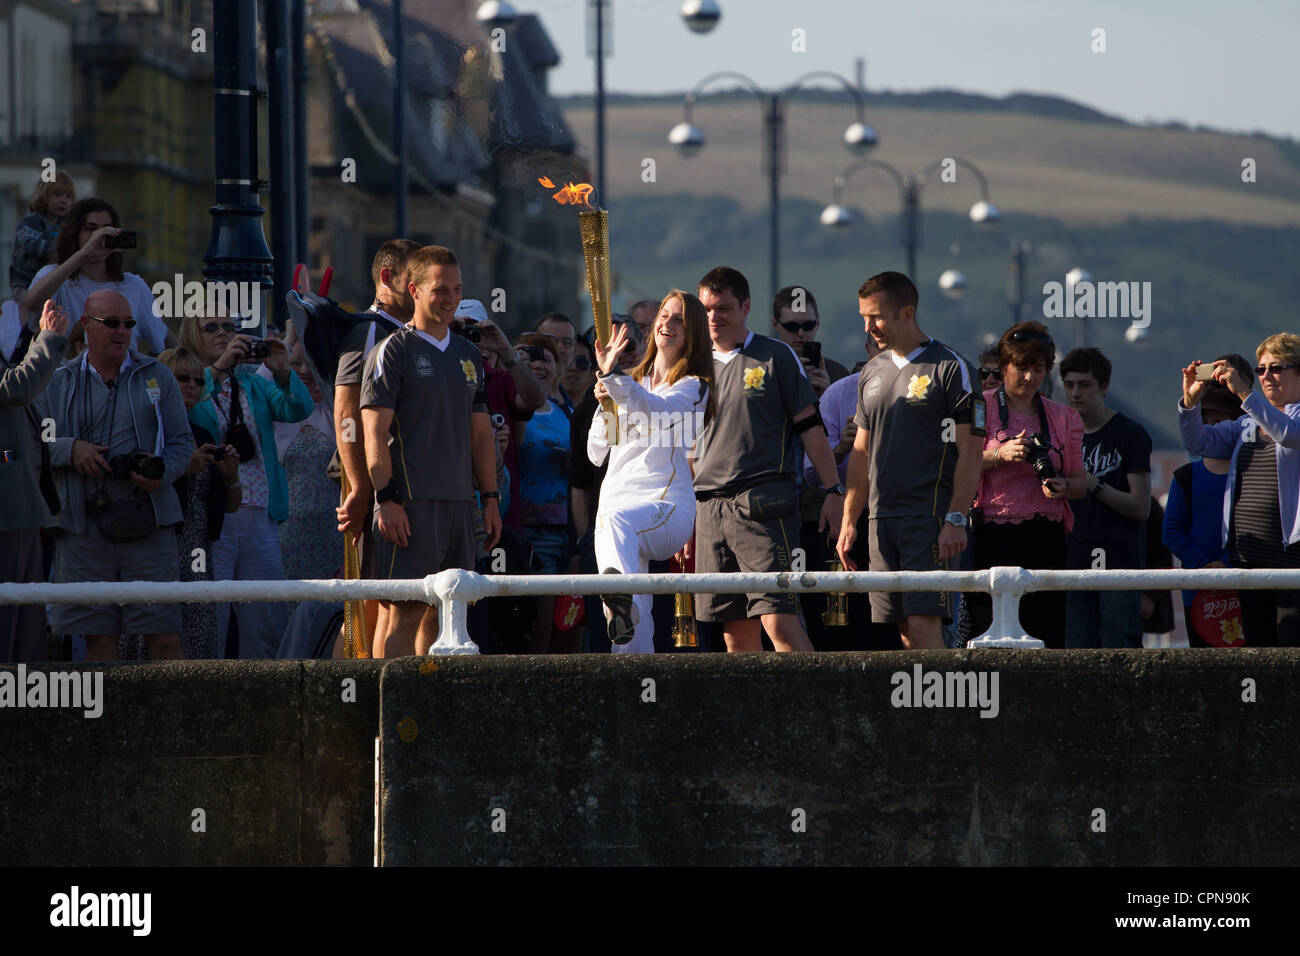 Olympic torch-bearer Carwen Richards  'kicks the bar' in Aberystwyth - Stock Image